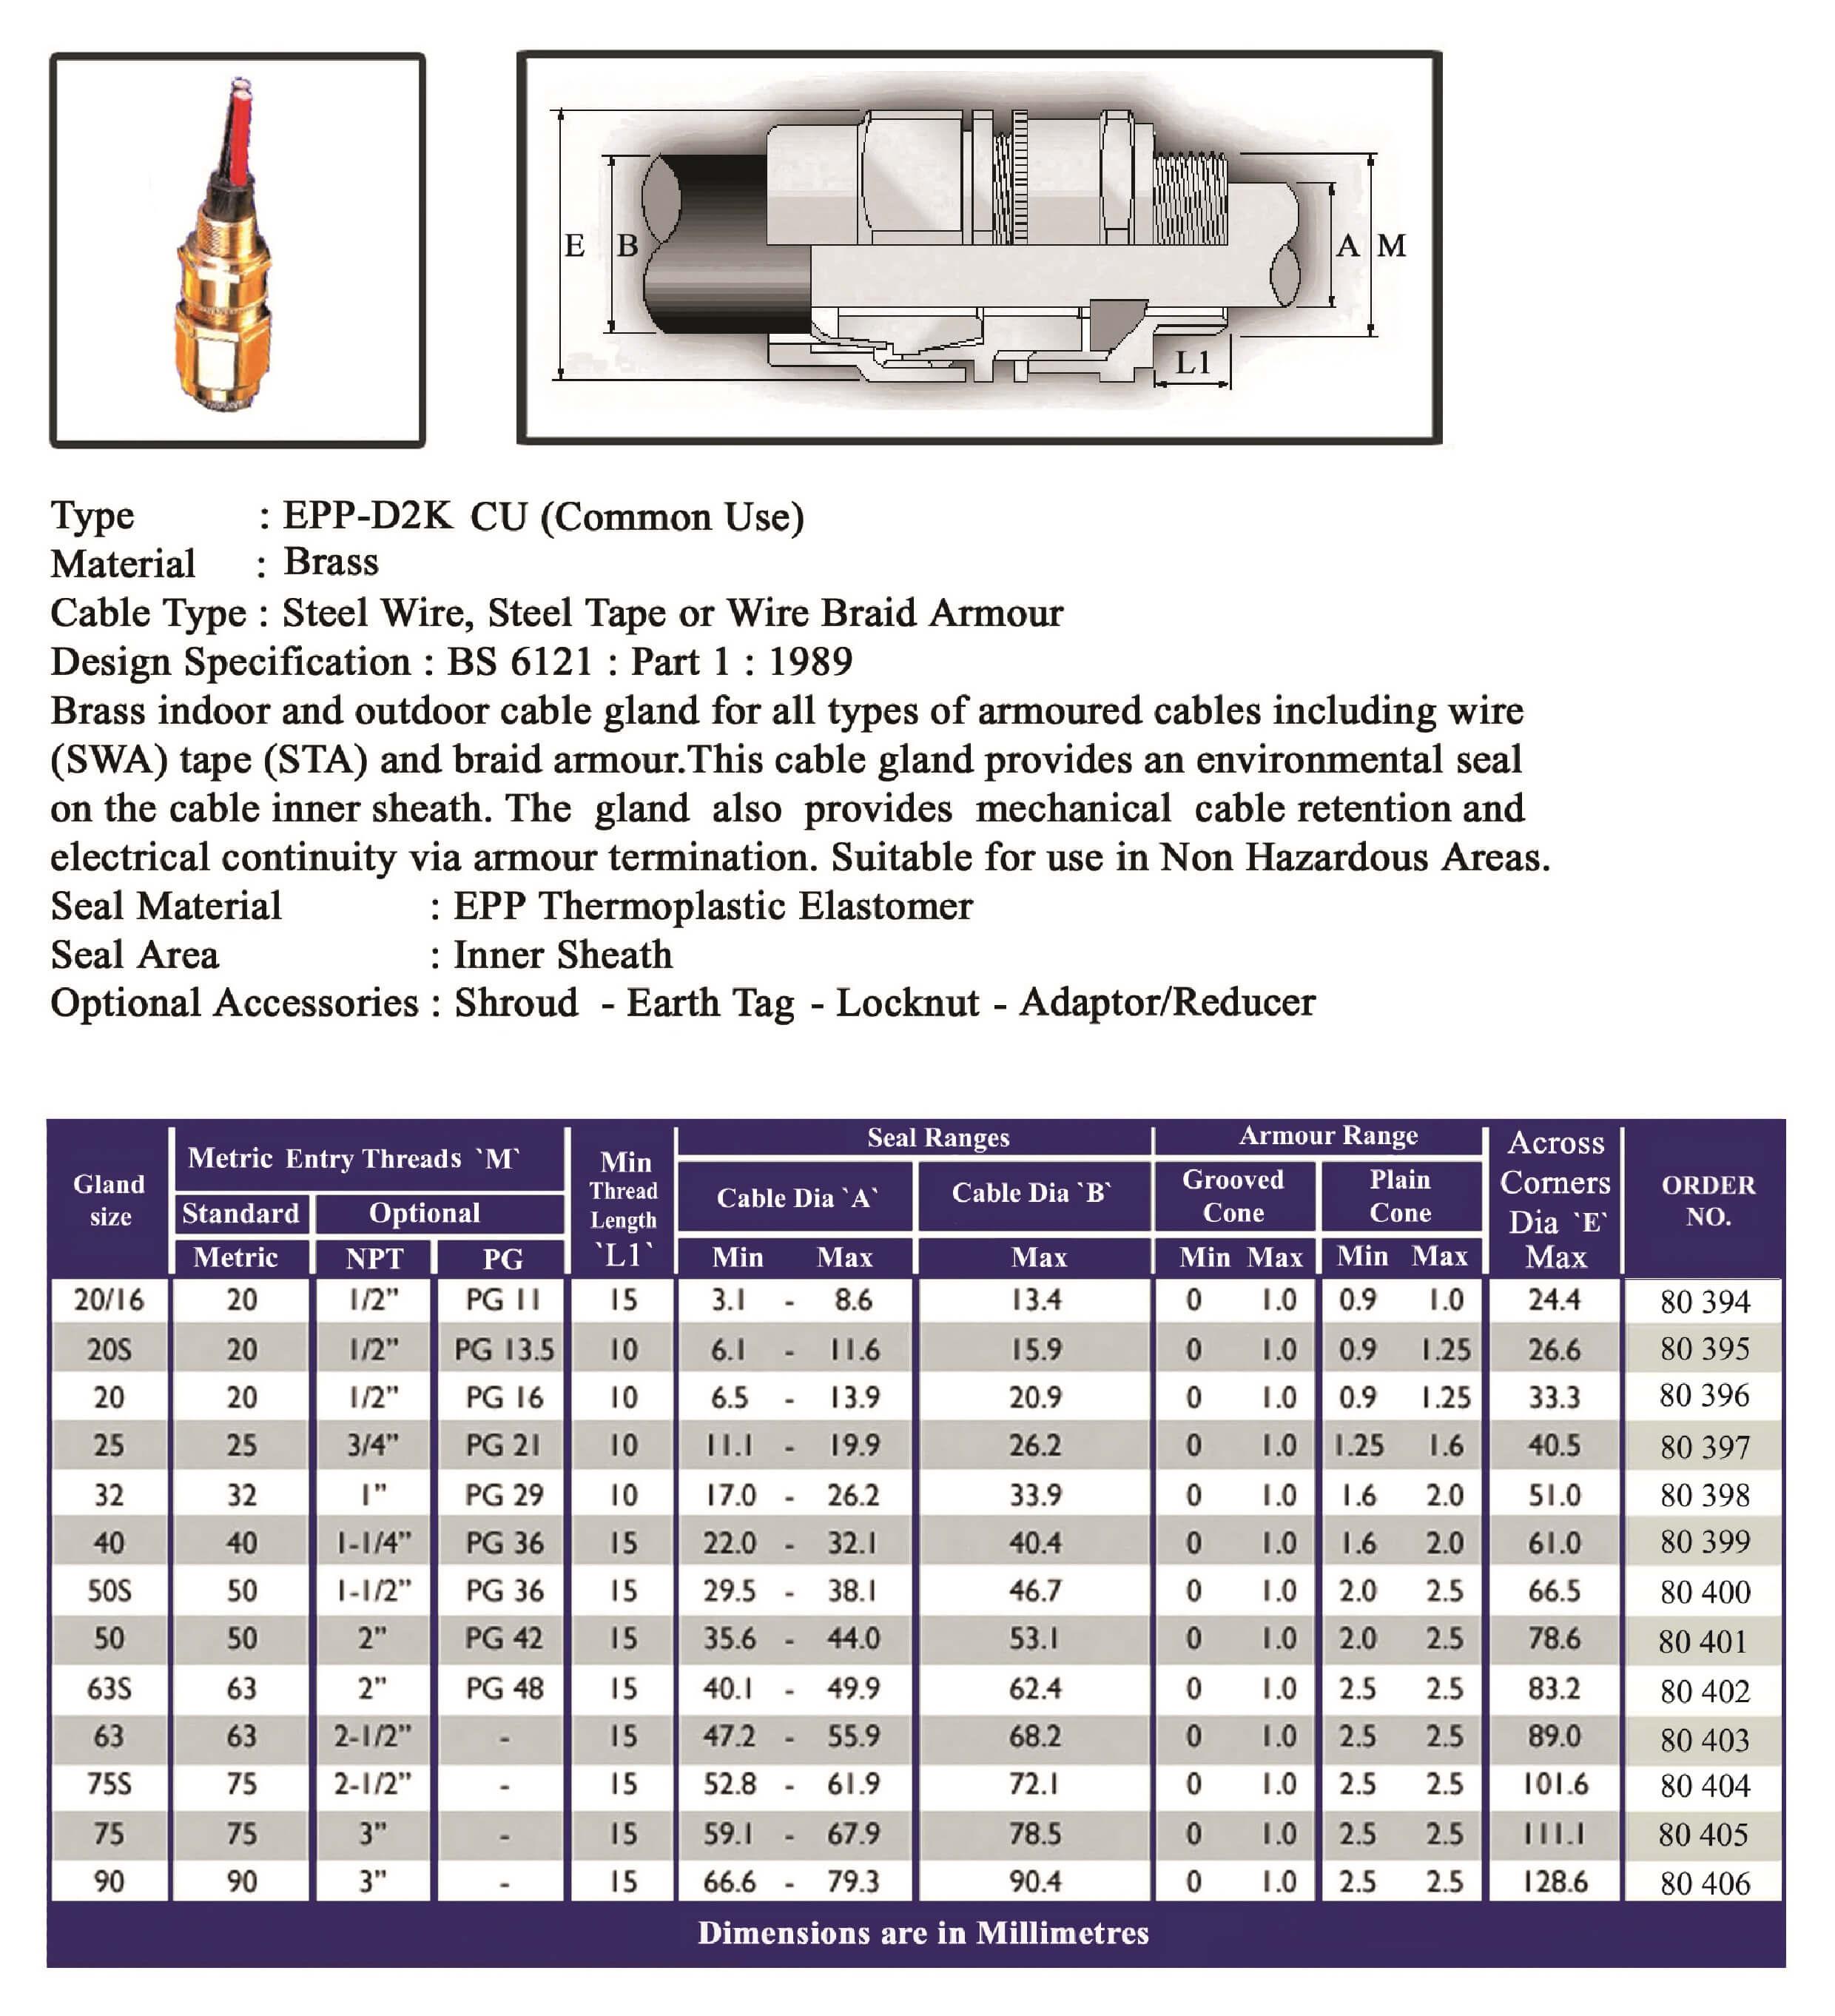 E.P.P - D2K CU (Common Use) Technical Datasheet